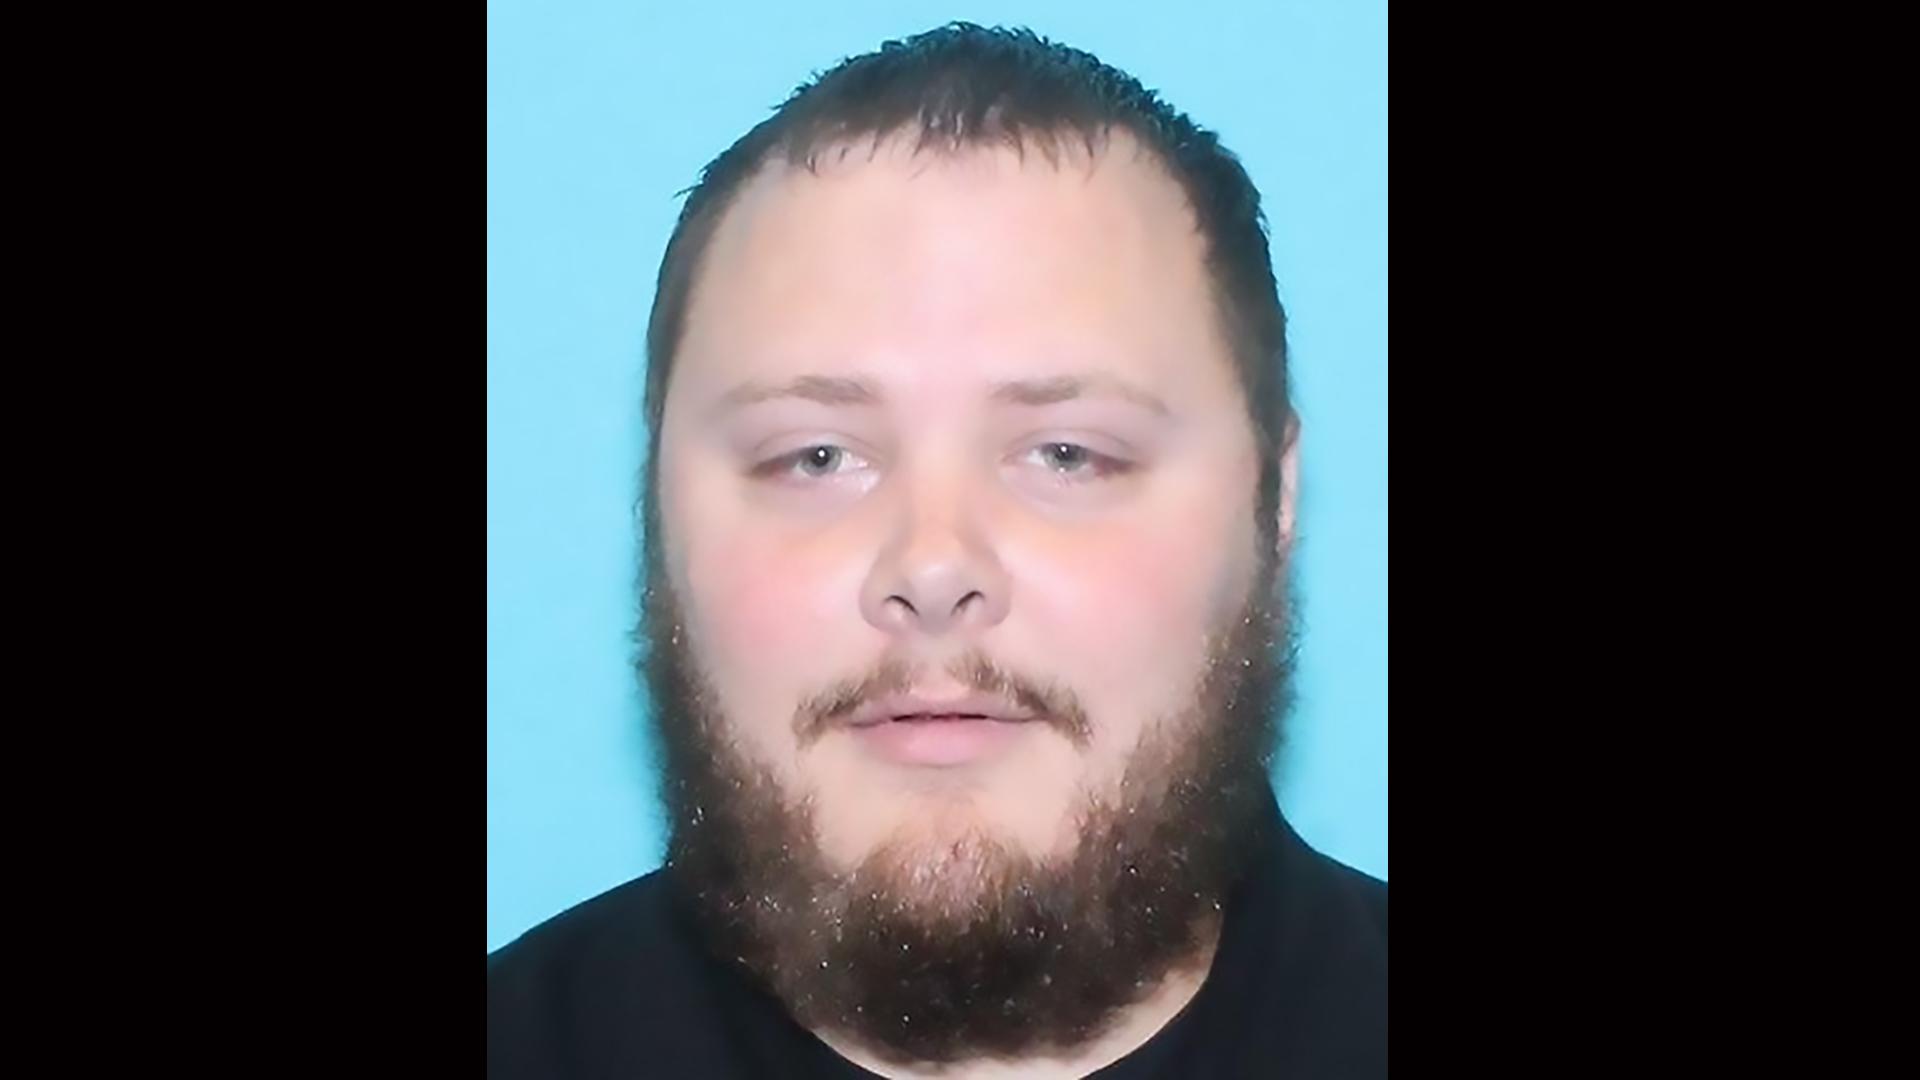 Devin Patrick Kelley Texas Church Shooter-159532.jpg42555032